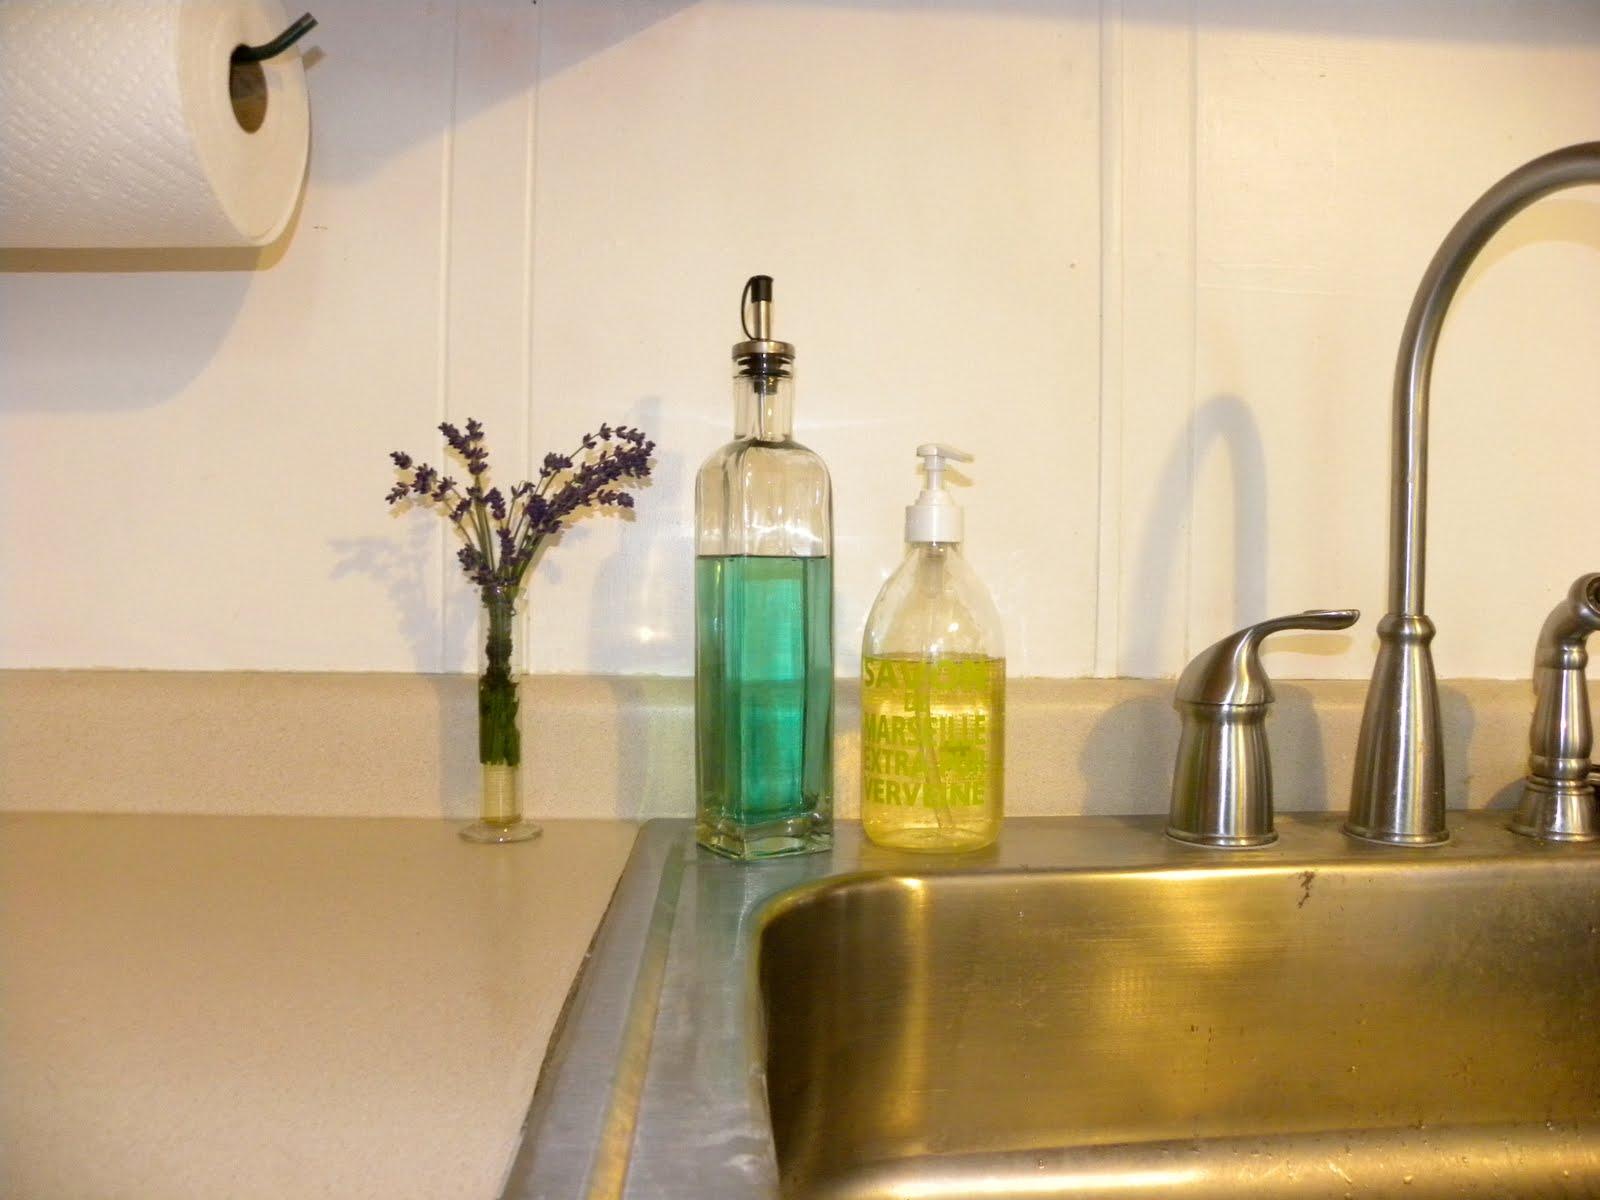 Kitchen Dish Soap Dispenser Lantern Lighting Cream City And Sugar Olive Oil